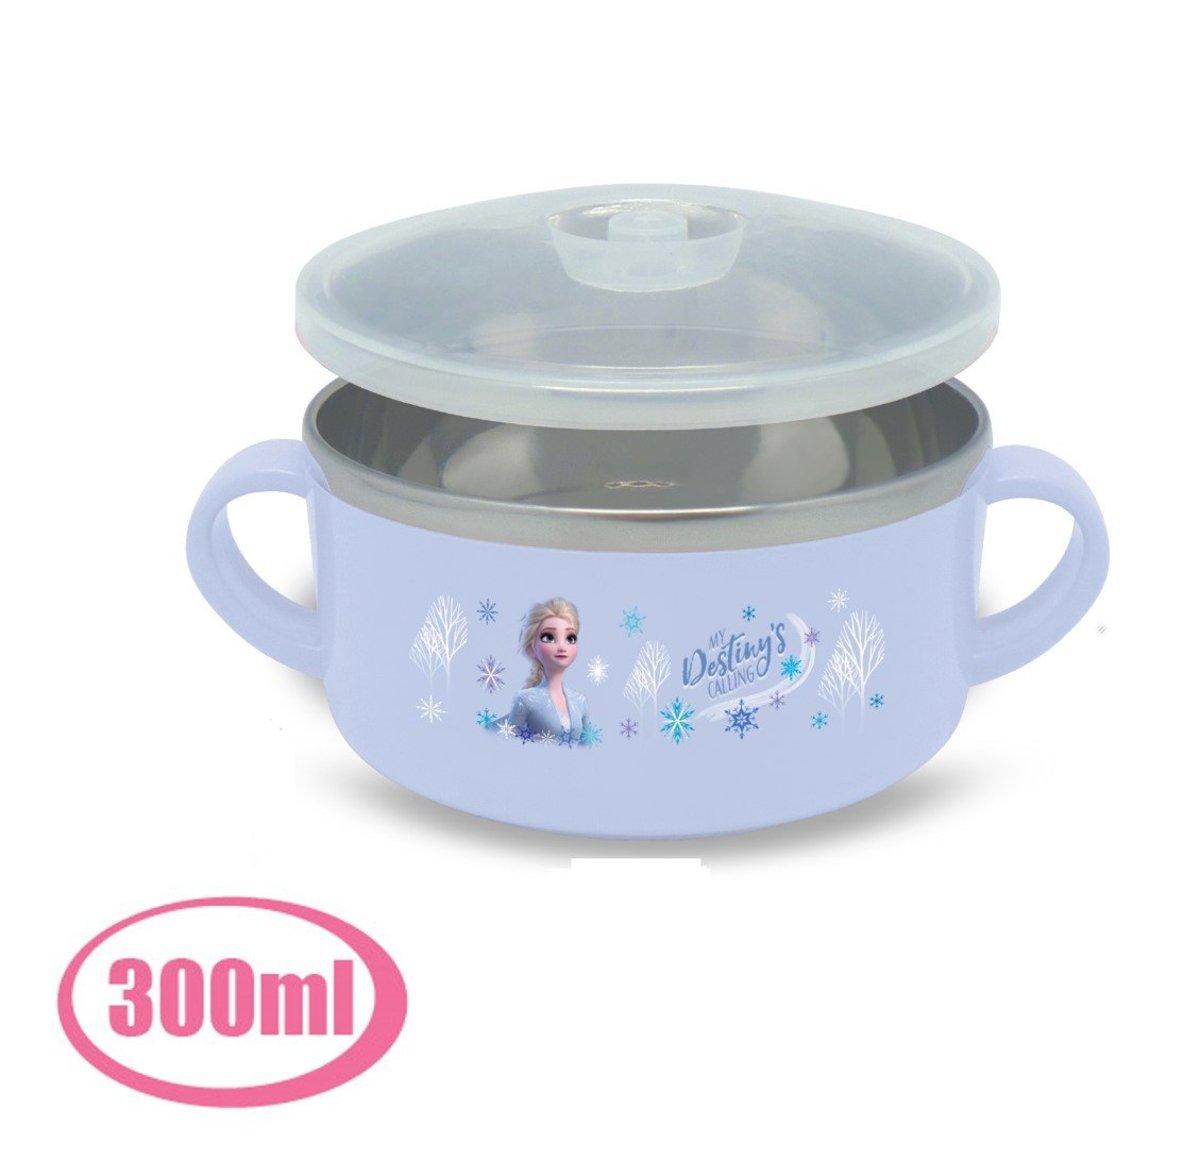 stainless steel  bowl(300ml)  (Licensed by Disney)